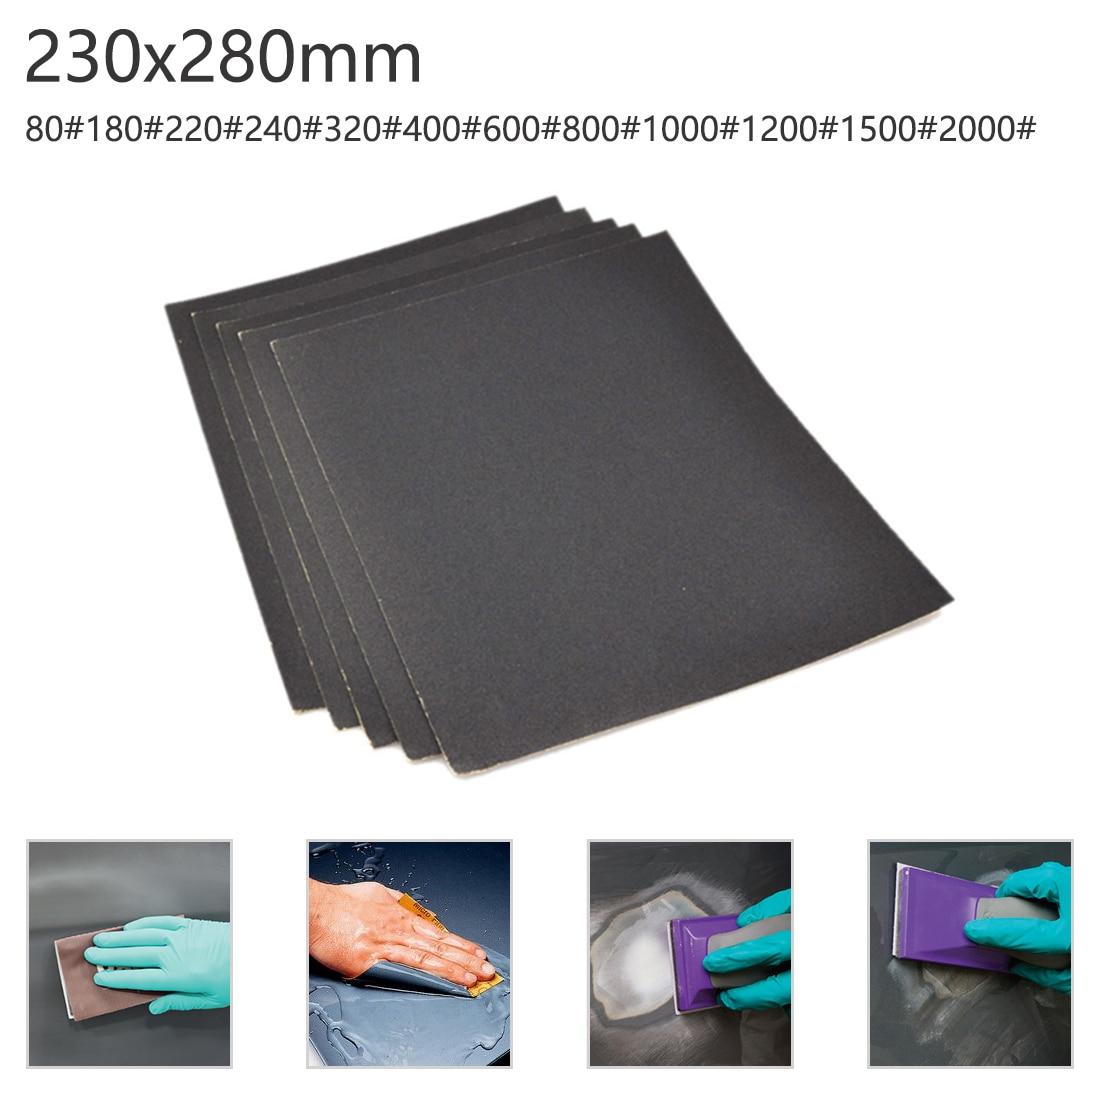 Waterproof Sandpaper Water Sand Paper Polishing Cloth Grit 80-2000 Mesh For Amber/ Bodhi/ Wood Dry Sand